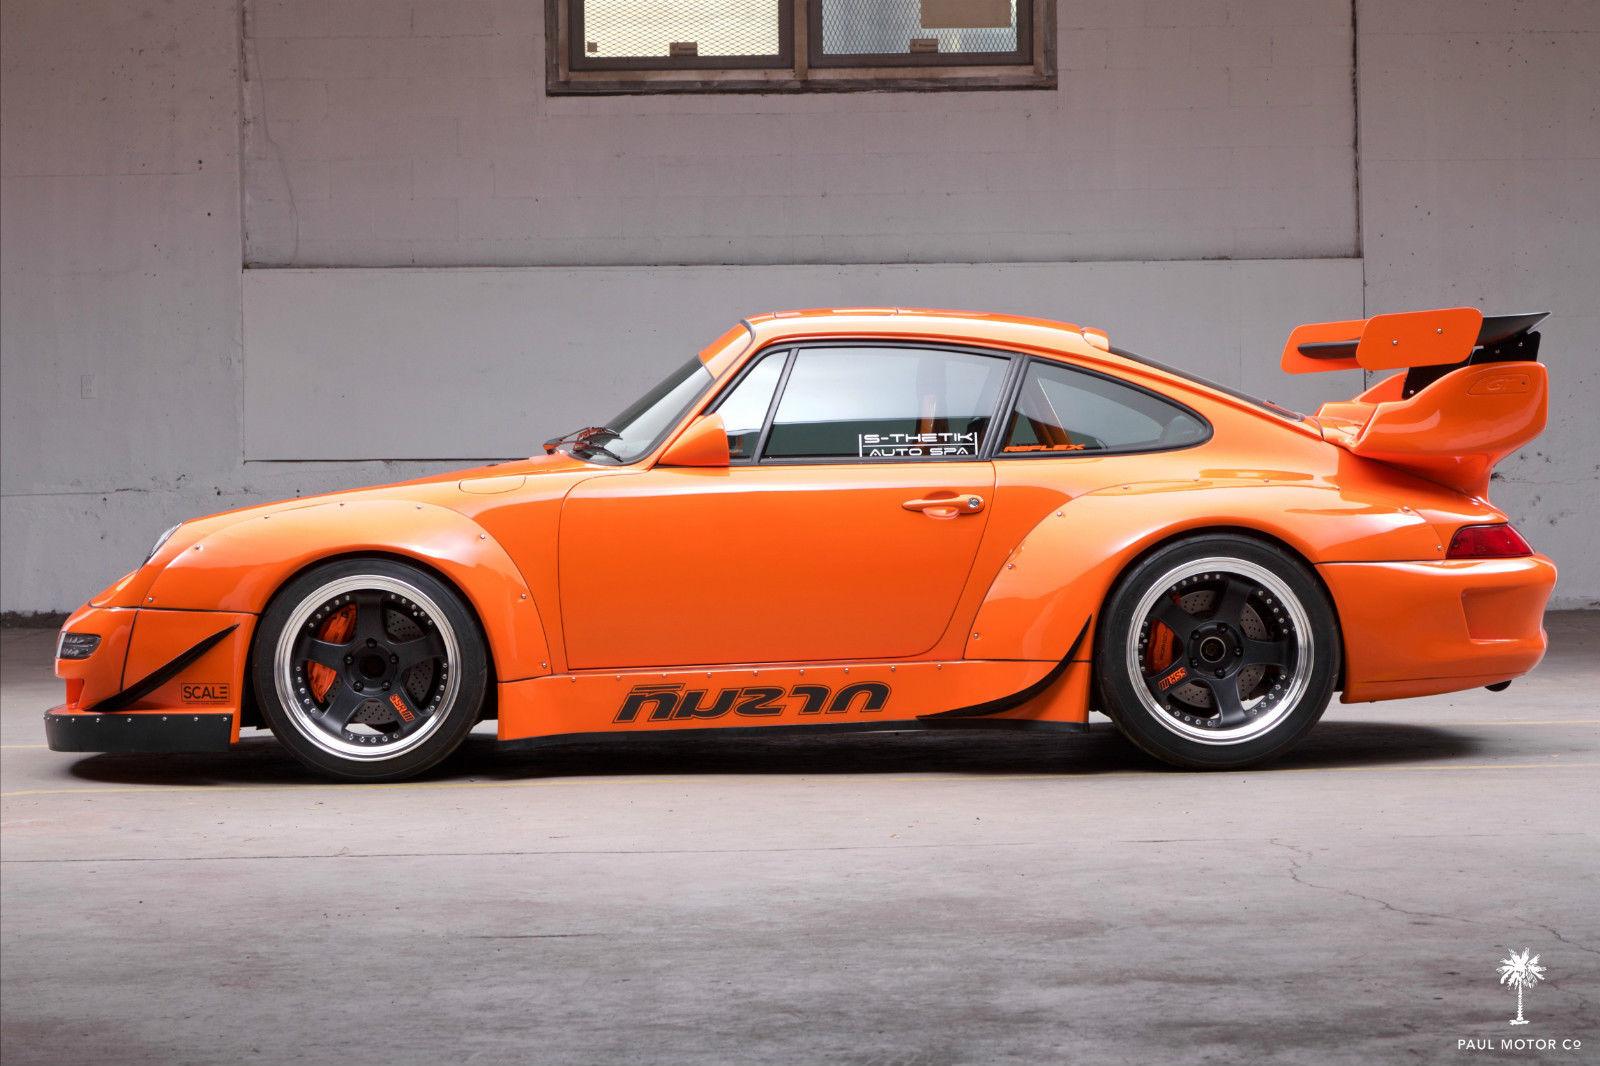 Barati Aron Elado Egy Corvette Motoros Porsche 911 Videoval Autoblog